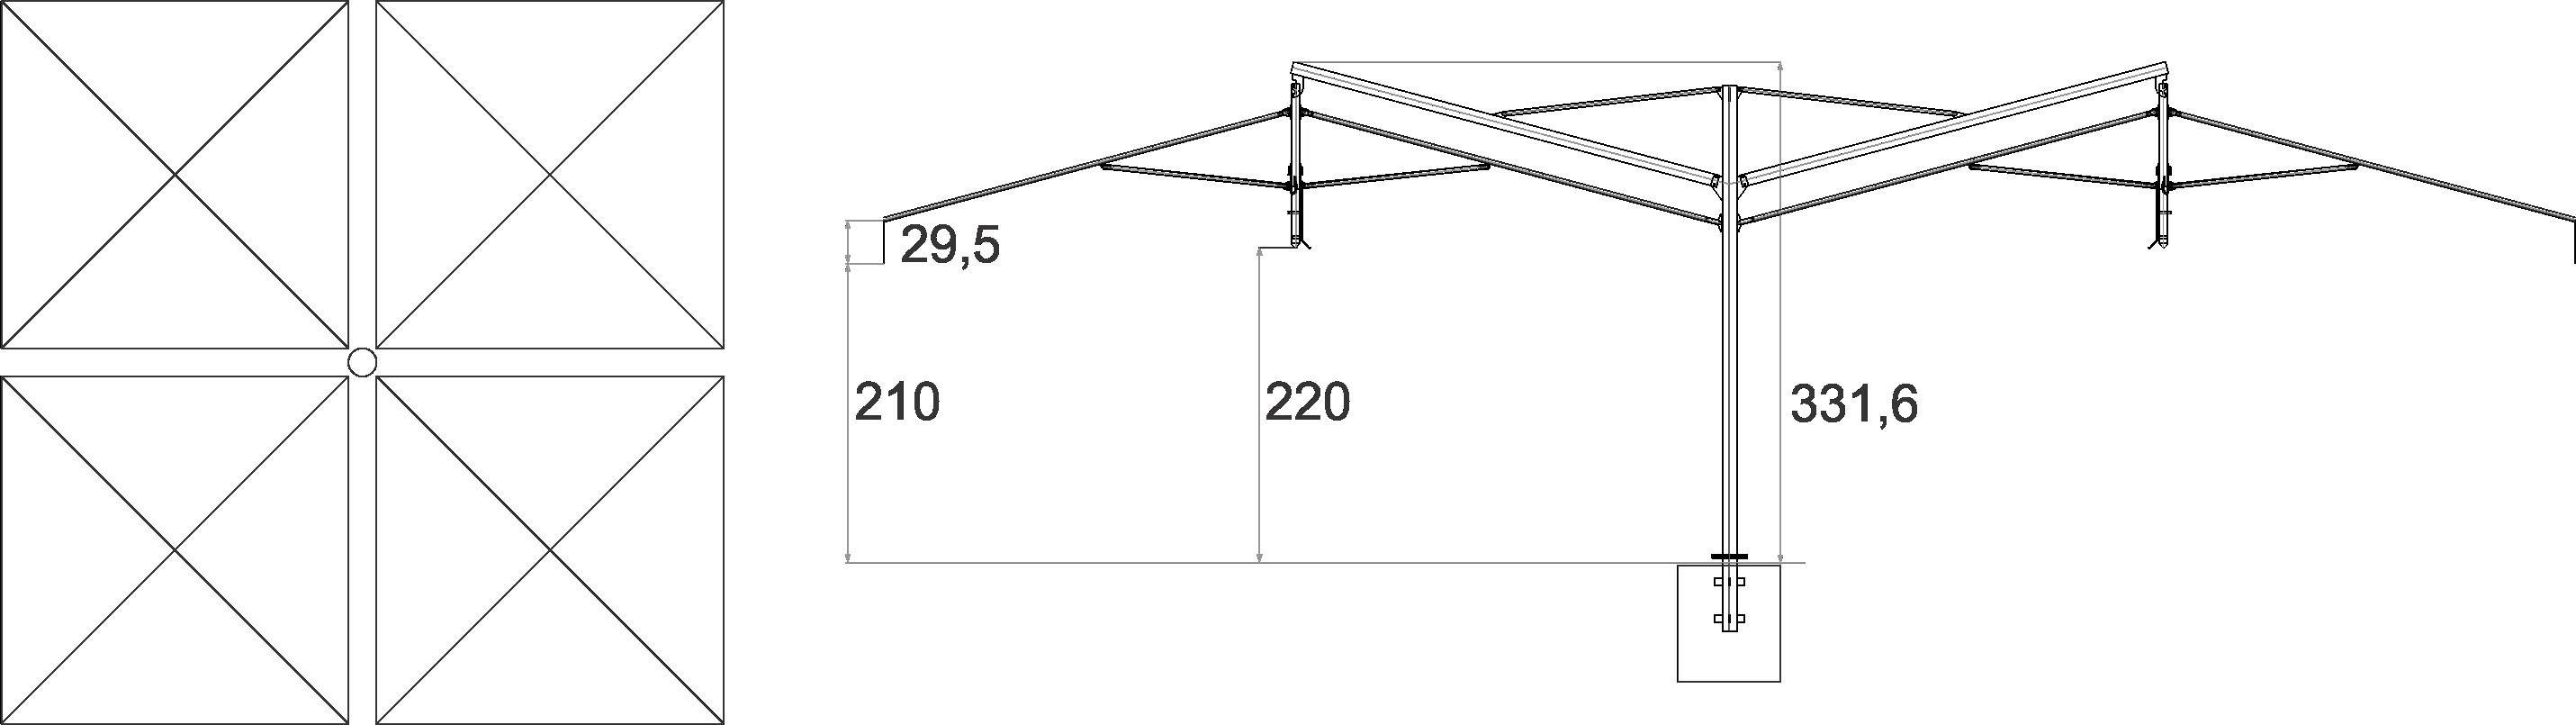 1557423868-console-quad-oznaka-visina-tabela-za-dimenzije.png